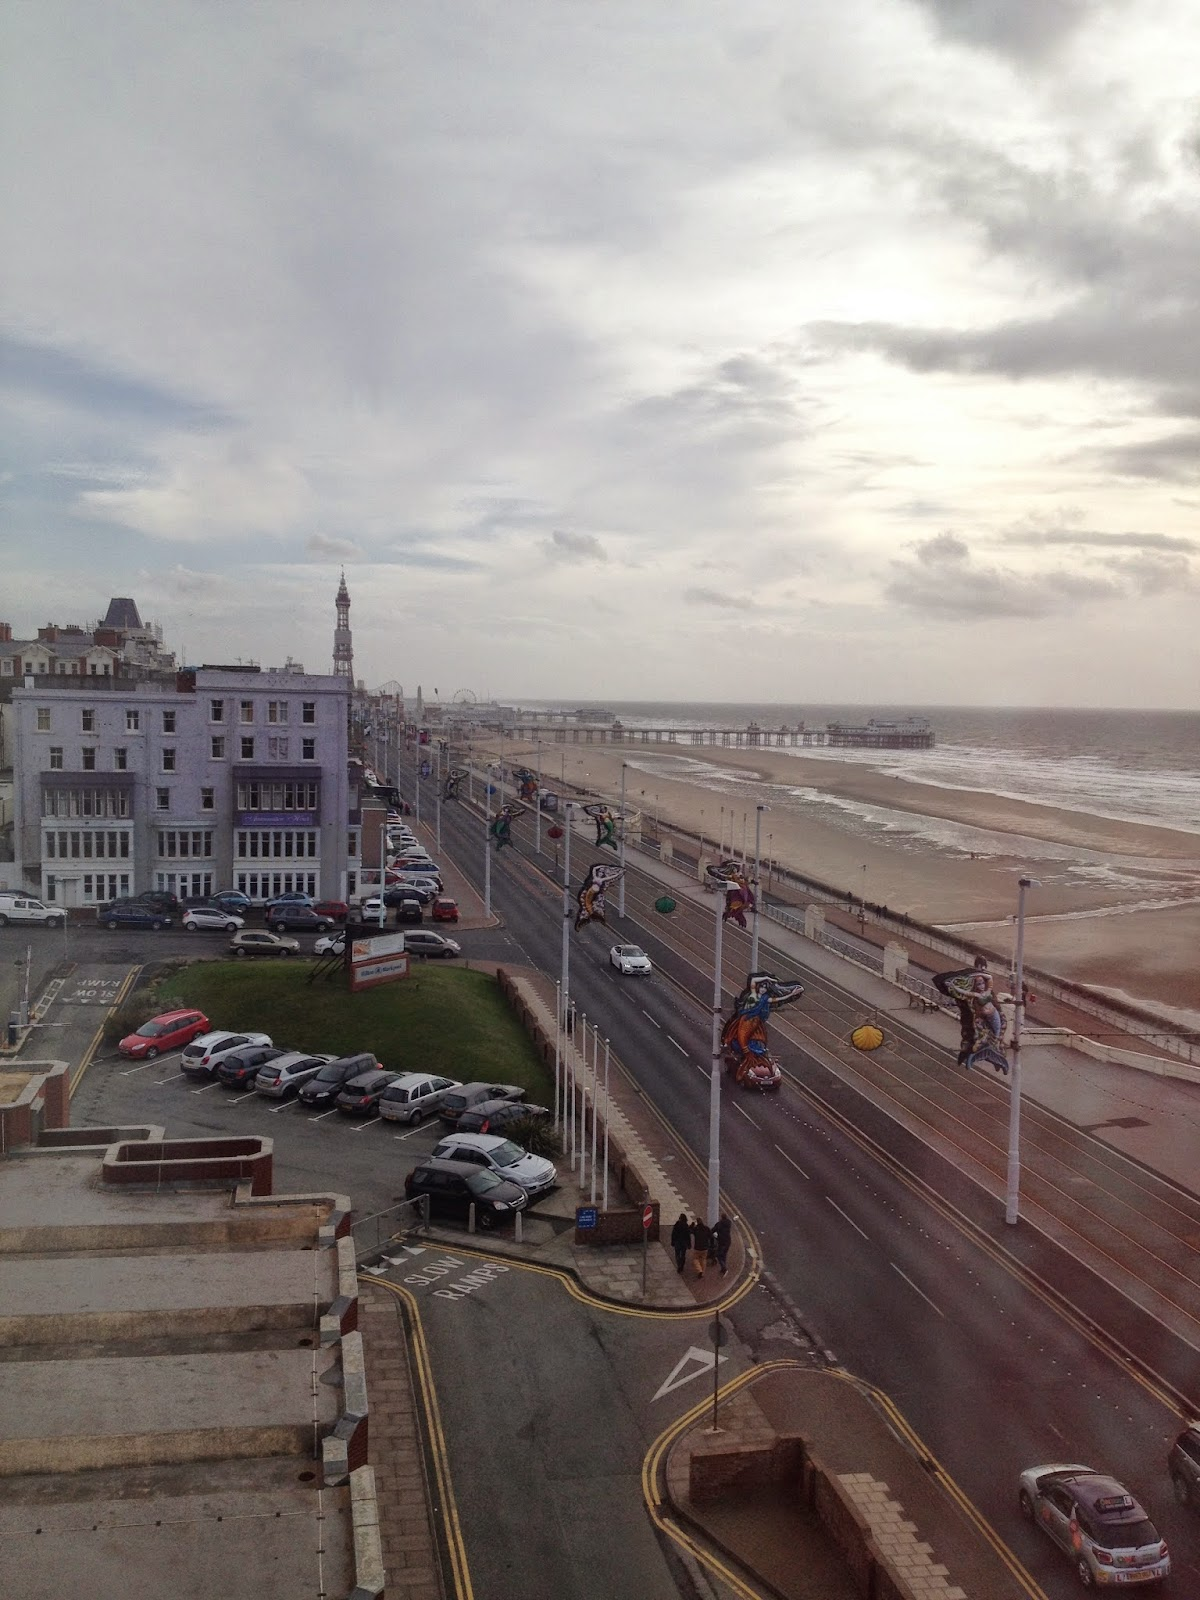 Hilton Blackpool view of Illuminations